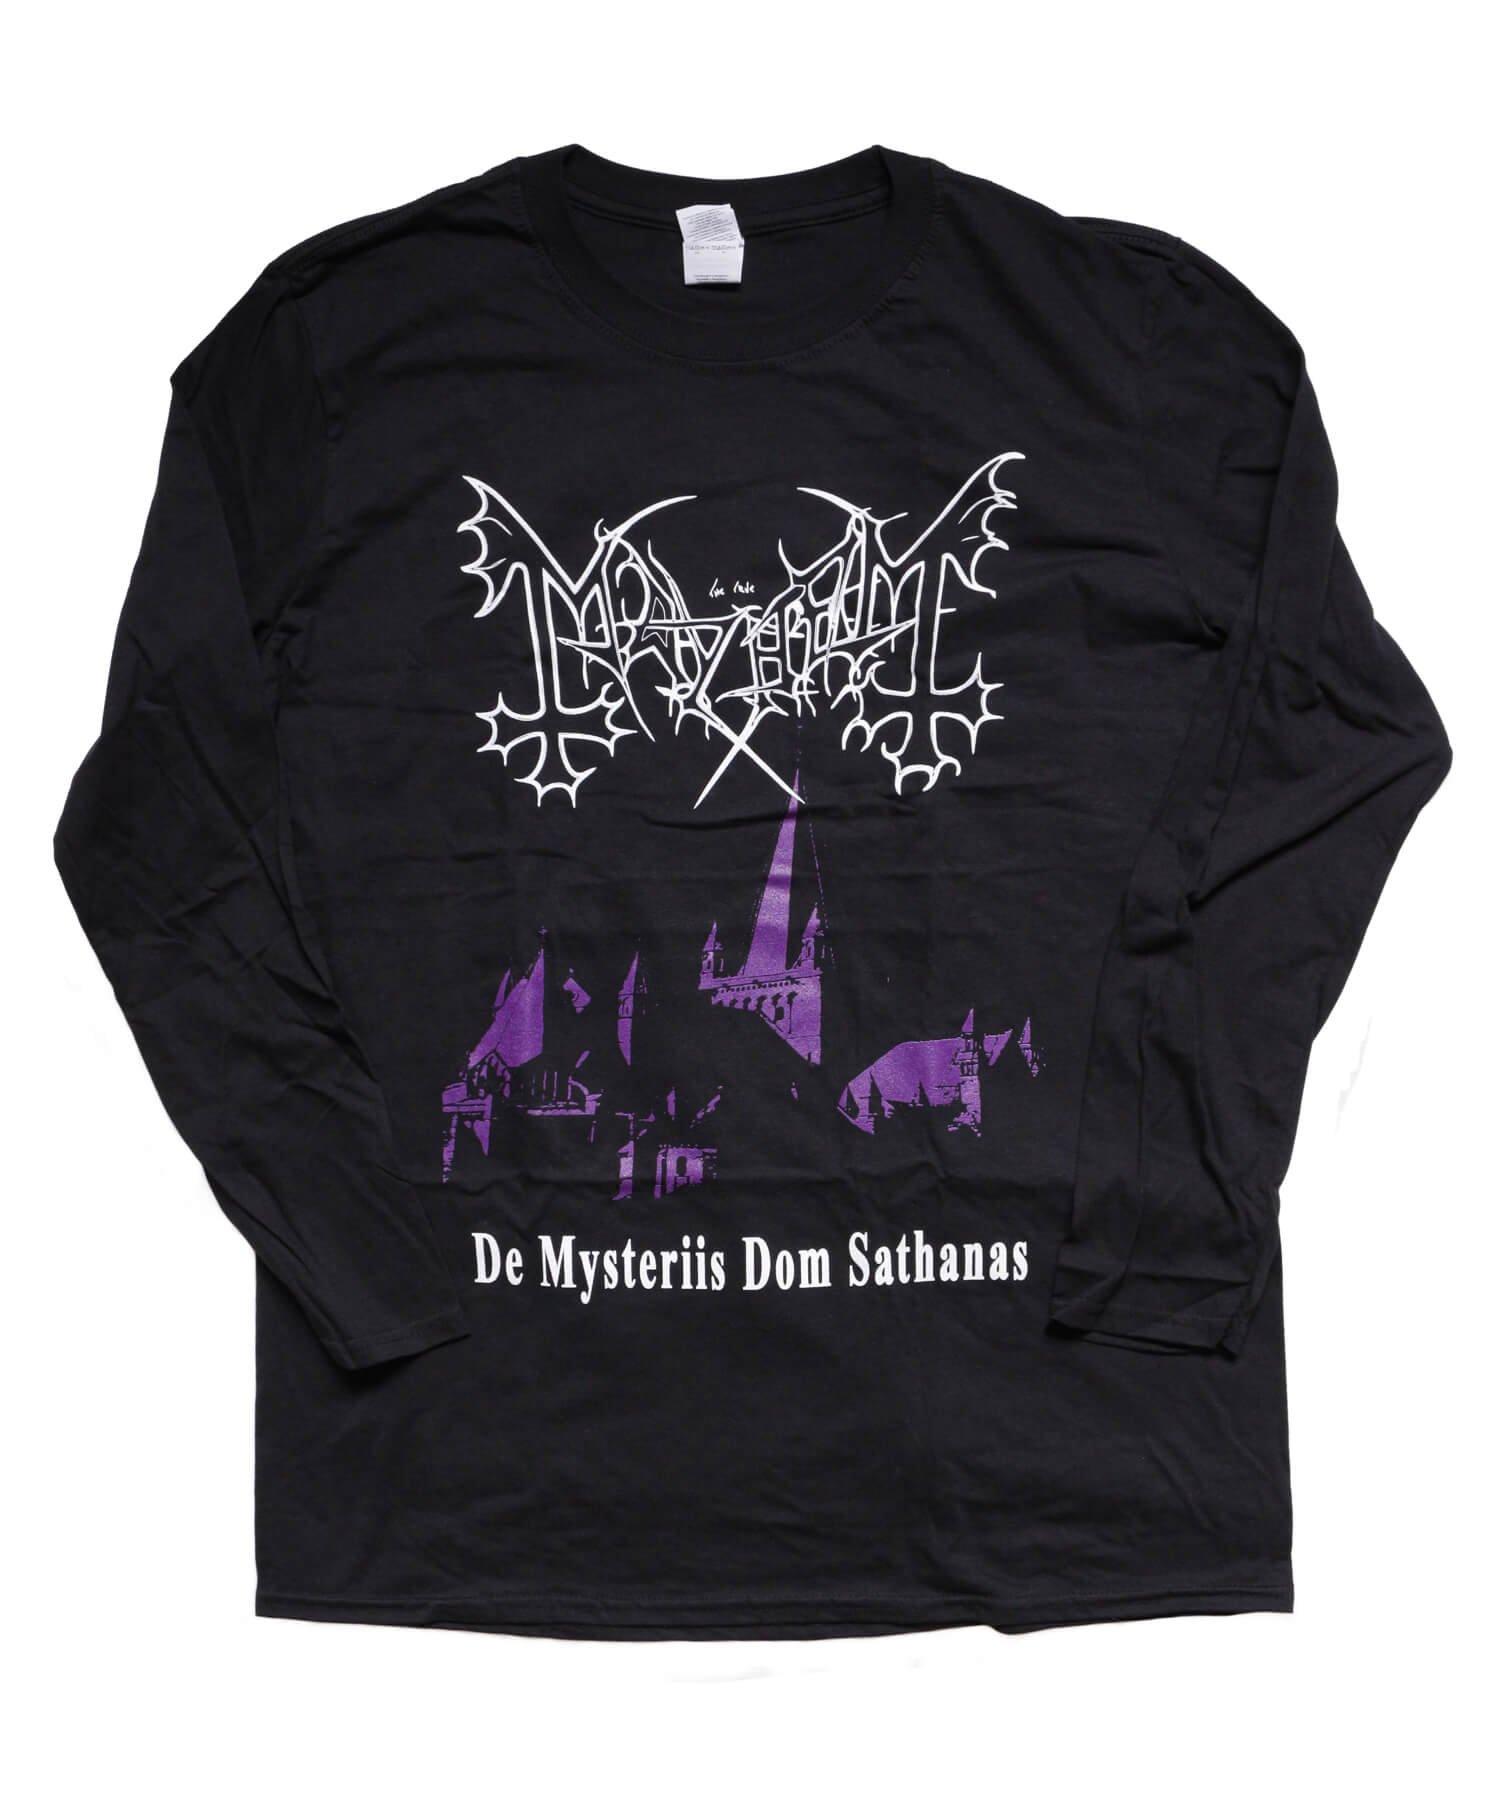 Official Artist Goods / バンドTなど |MAYHEM / メイヘム:DE MYSTERIIS DOM SATHANAS LONG SLEEVE SHIRT (BLACK) 商品画像1